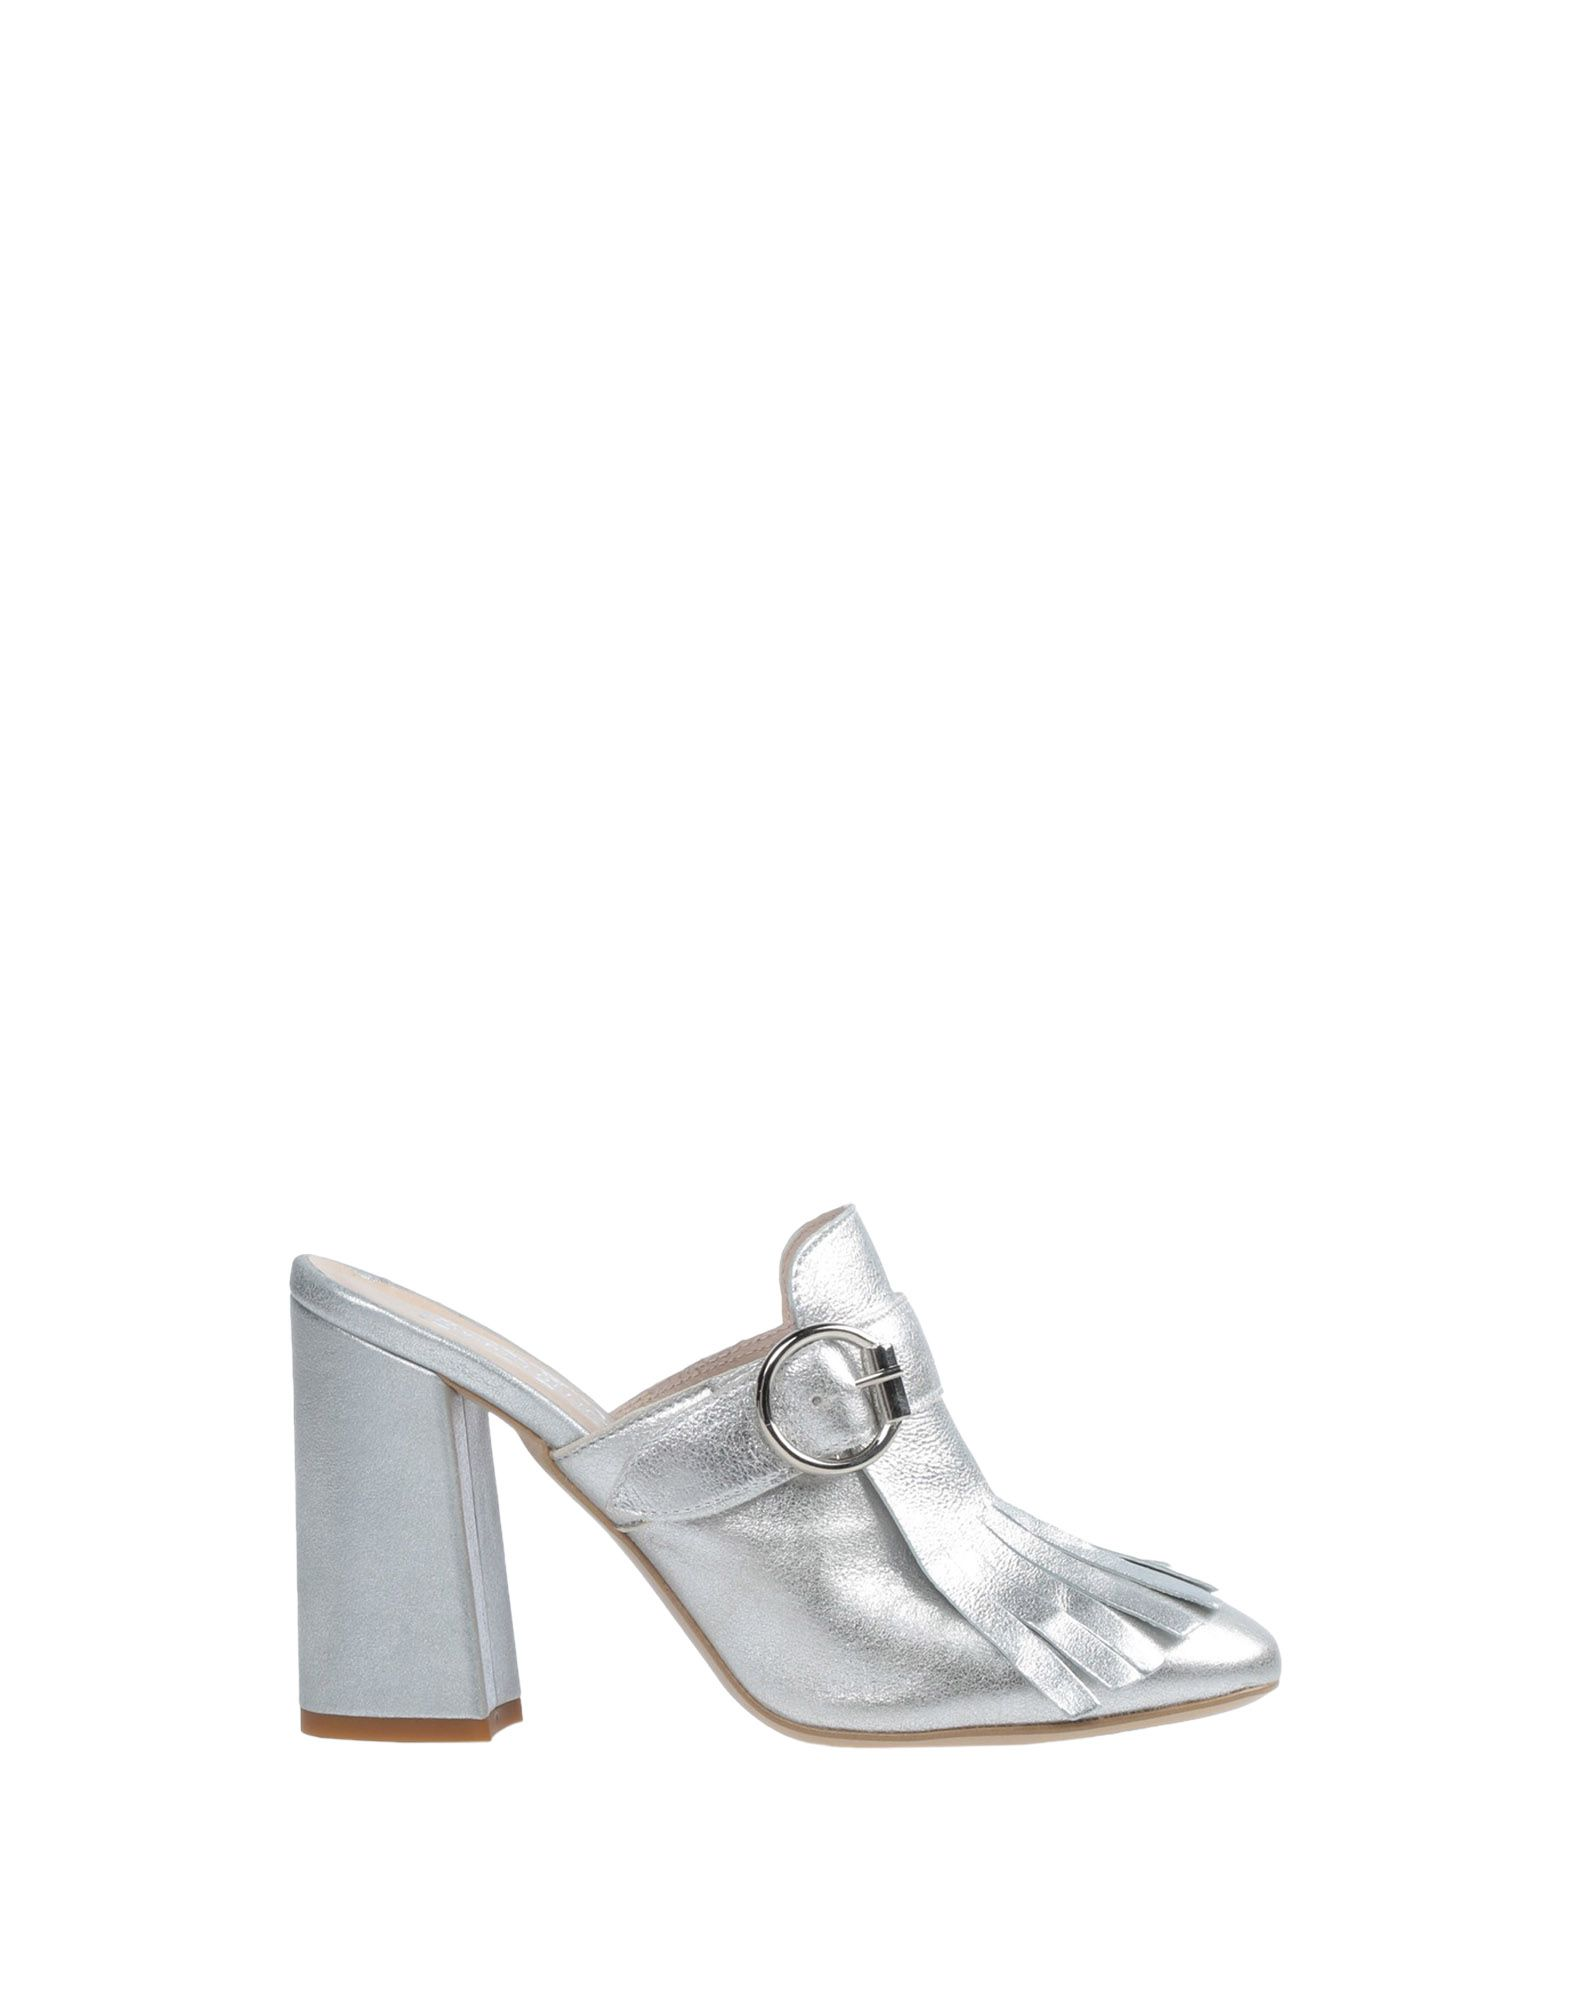 Divine Follie Pantoletten Qualität Damen  11522965QG Gute Qualität Pantoletten beliebte Schuhe c4c503